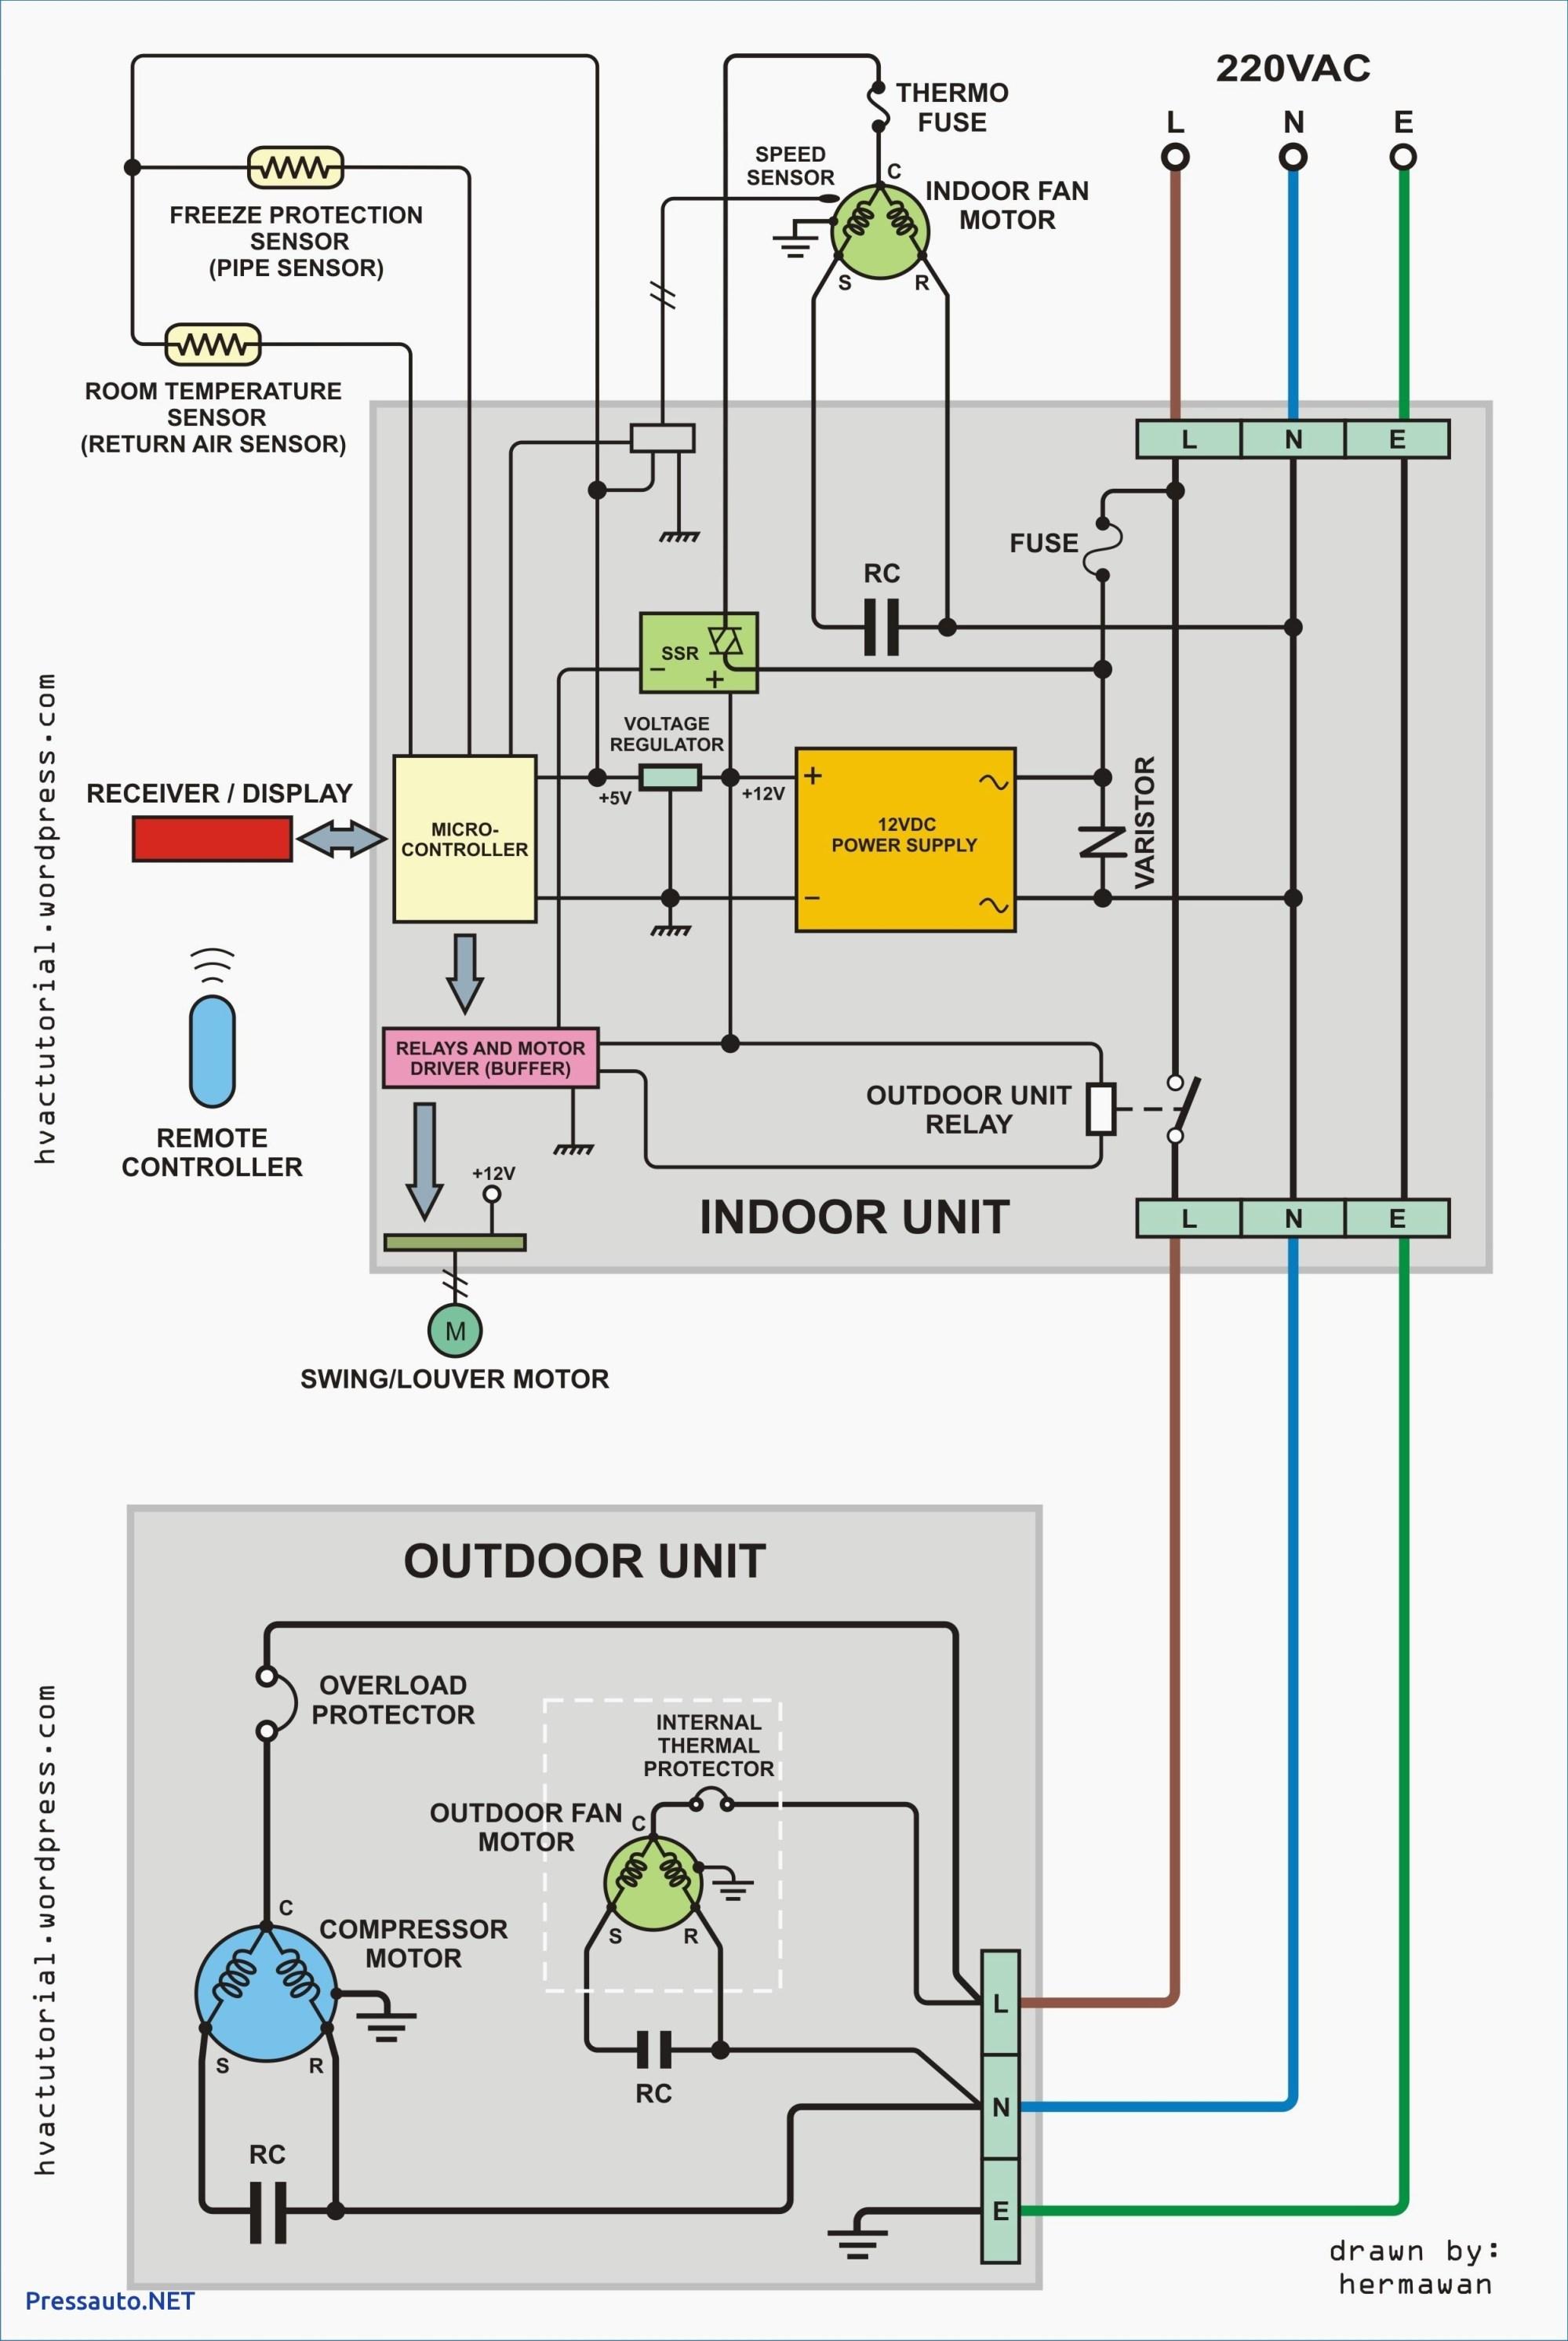 hight resolution of trane xv95 thermostat wiring diagram thermostat wiring diagram explained new trane 2e